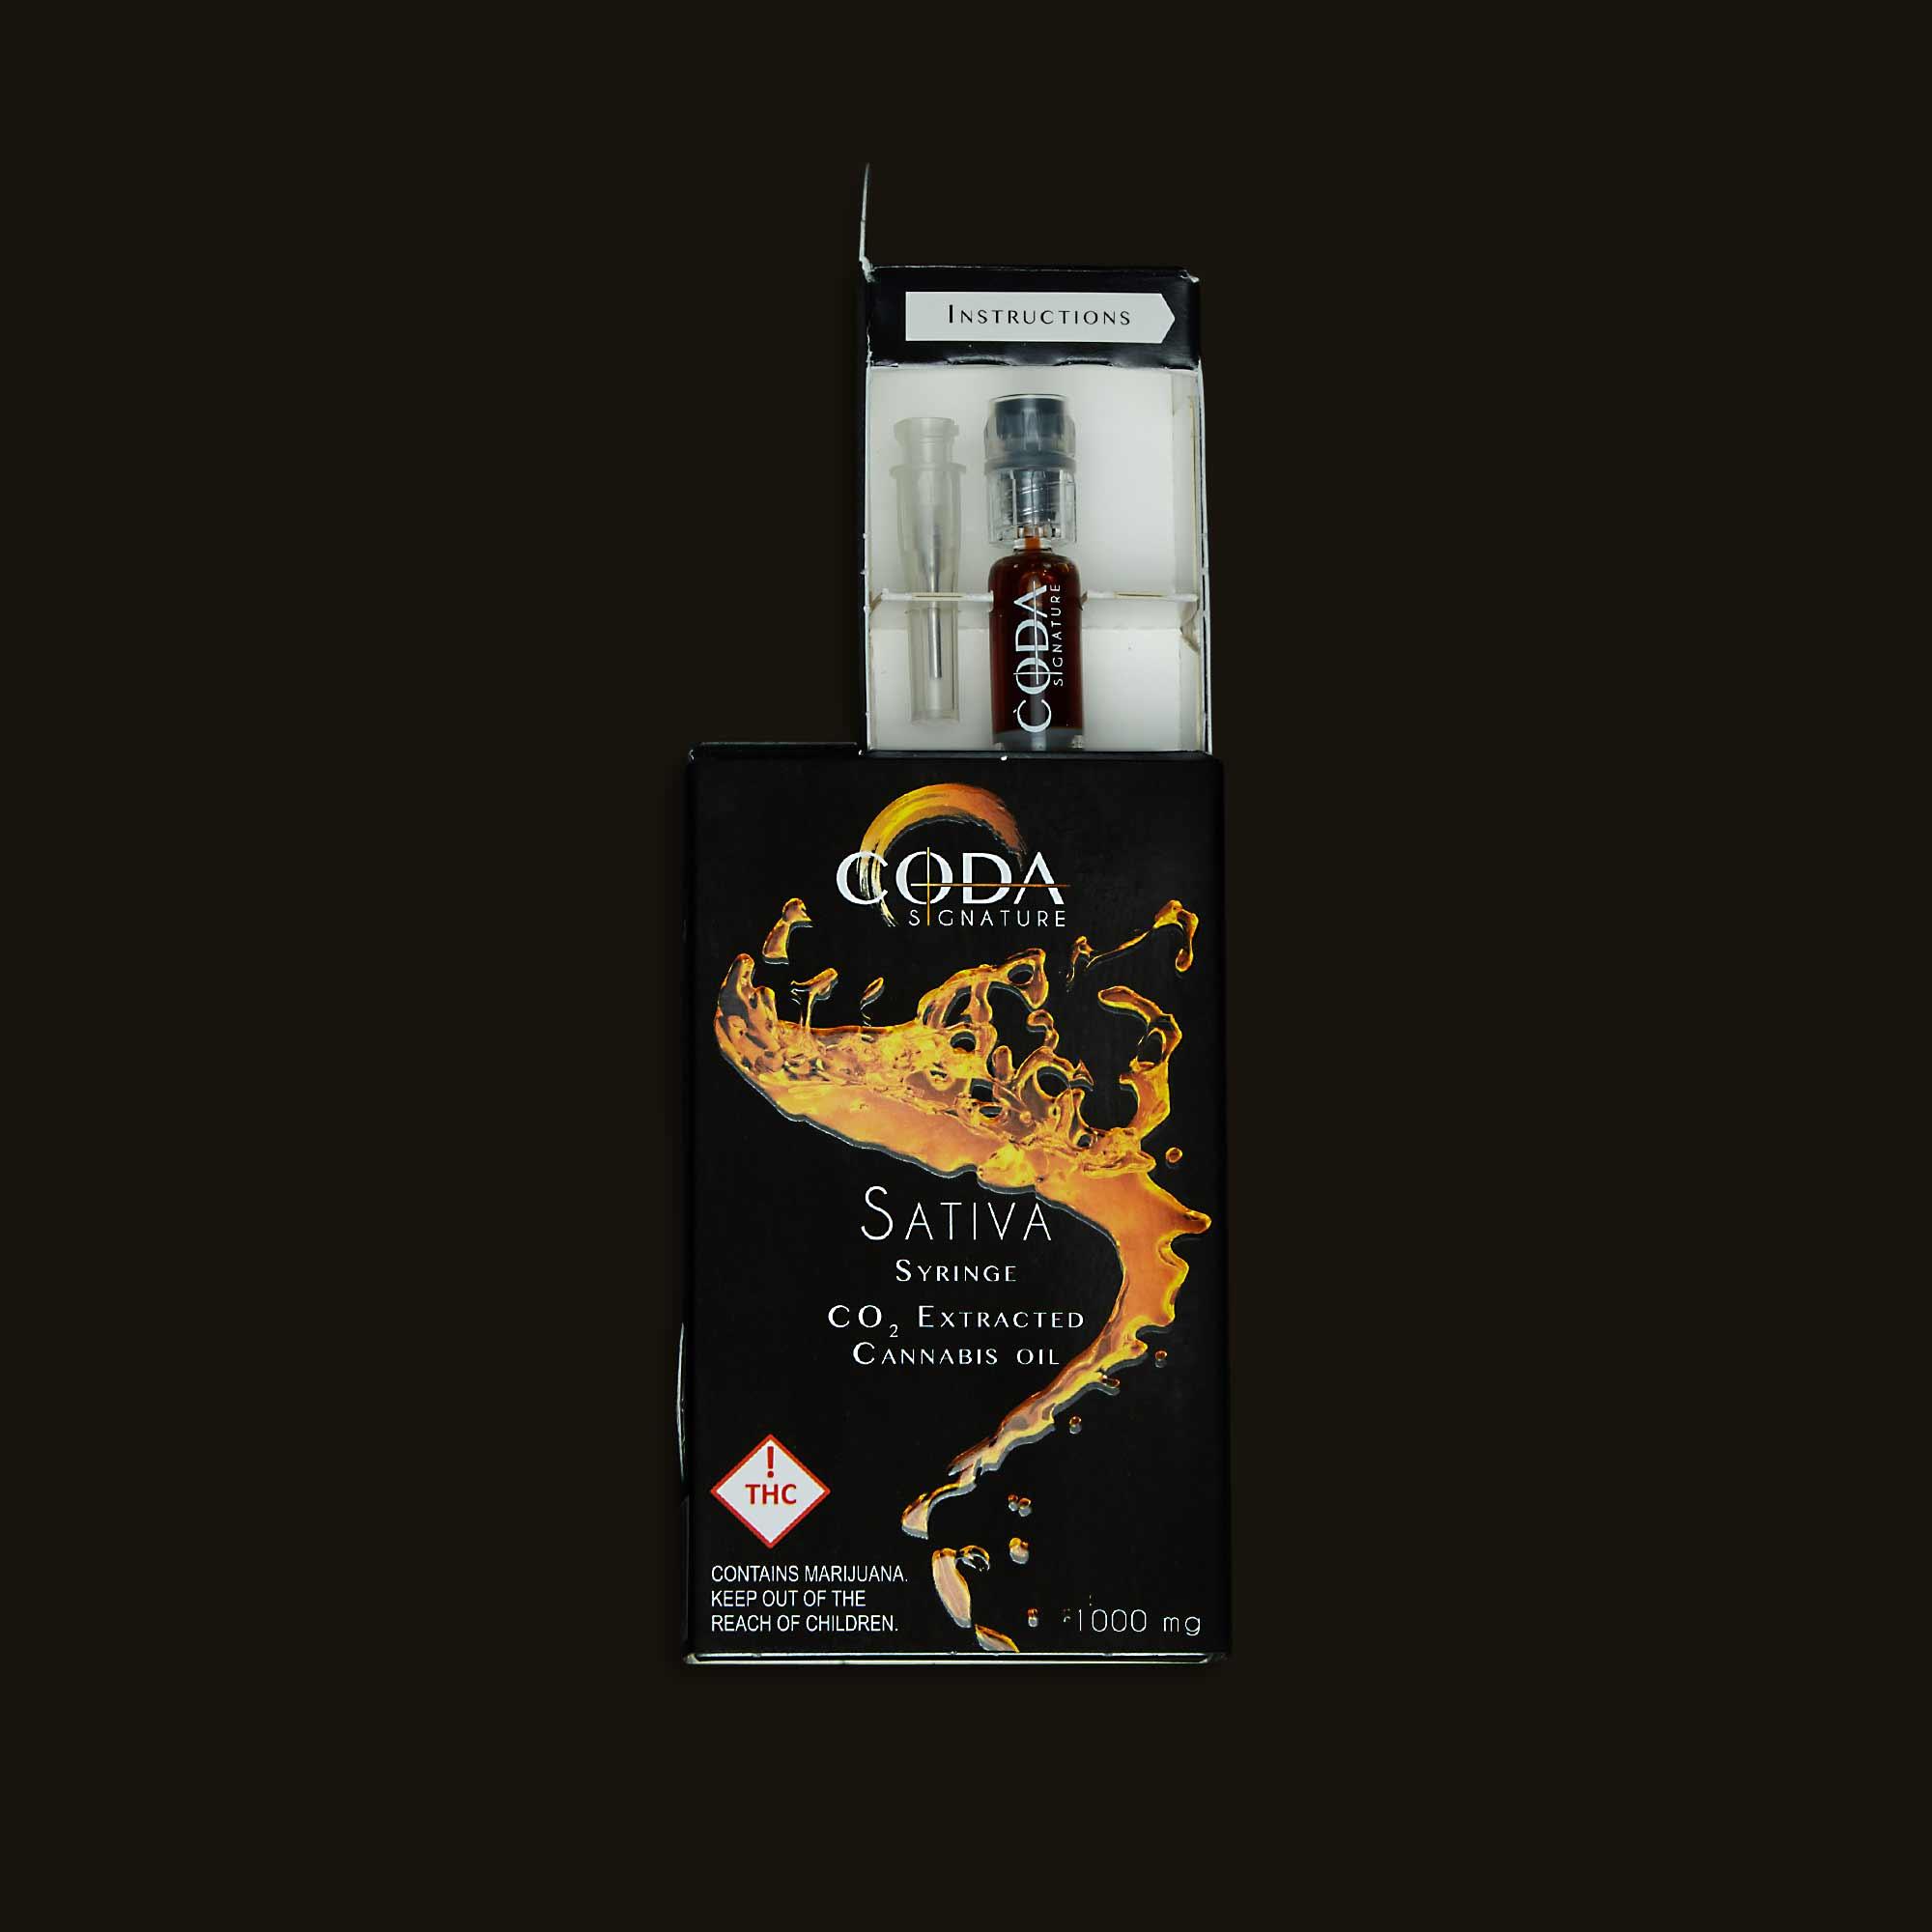 Coda Signature Sativa Oil Syringe